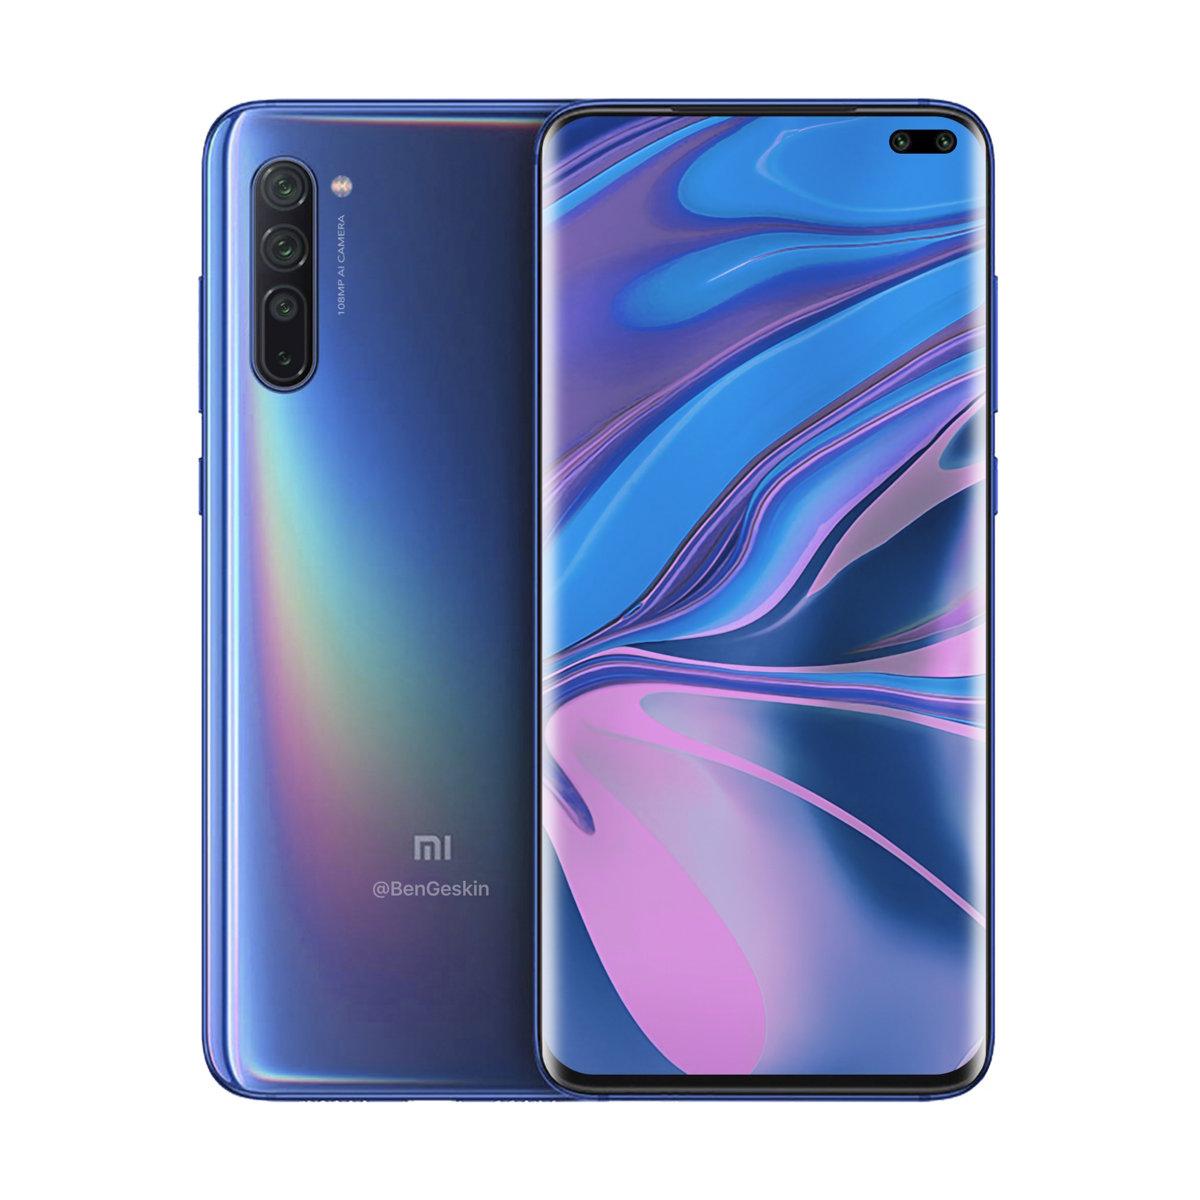 render del Xiaomi Mi 10 Pro